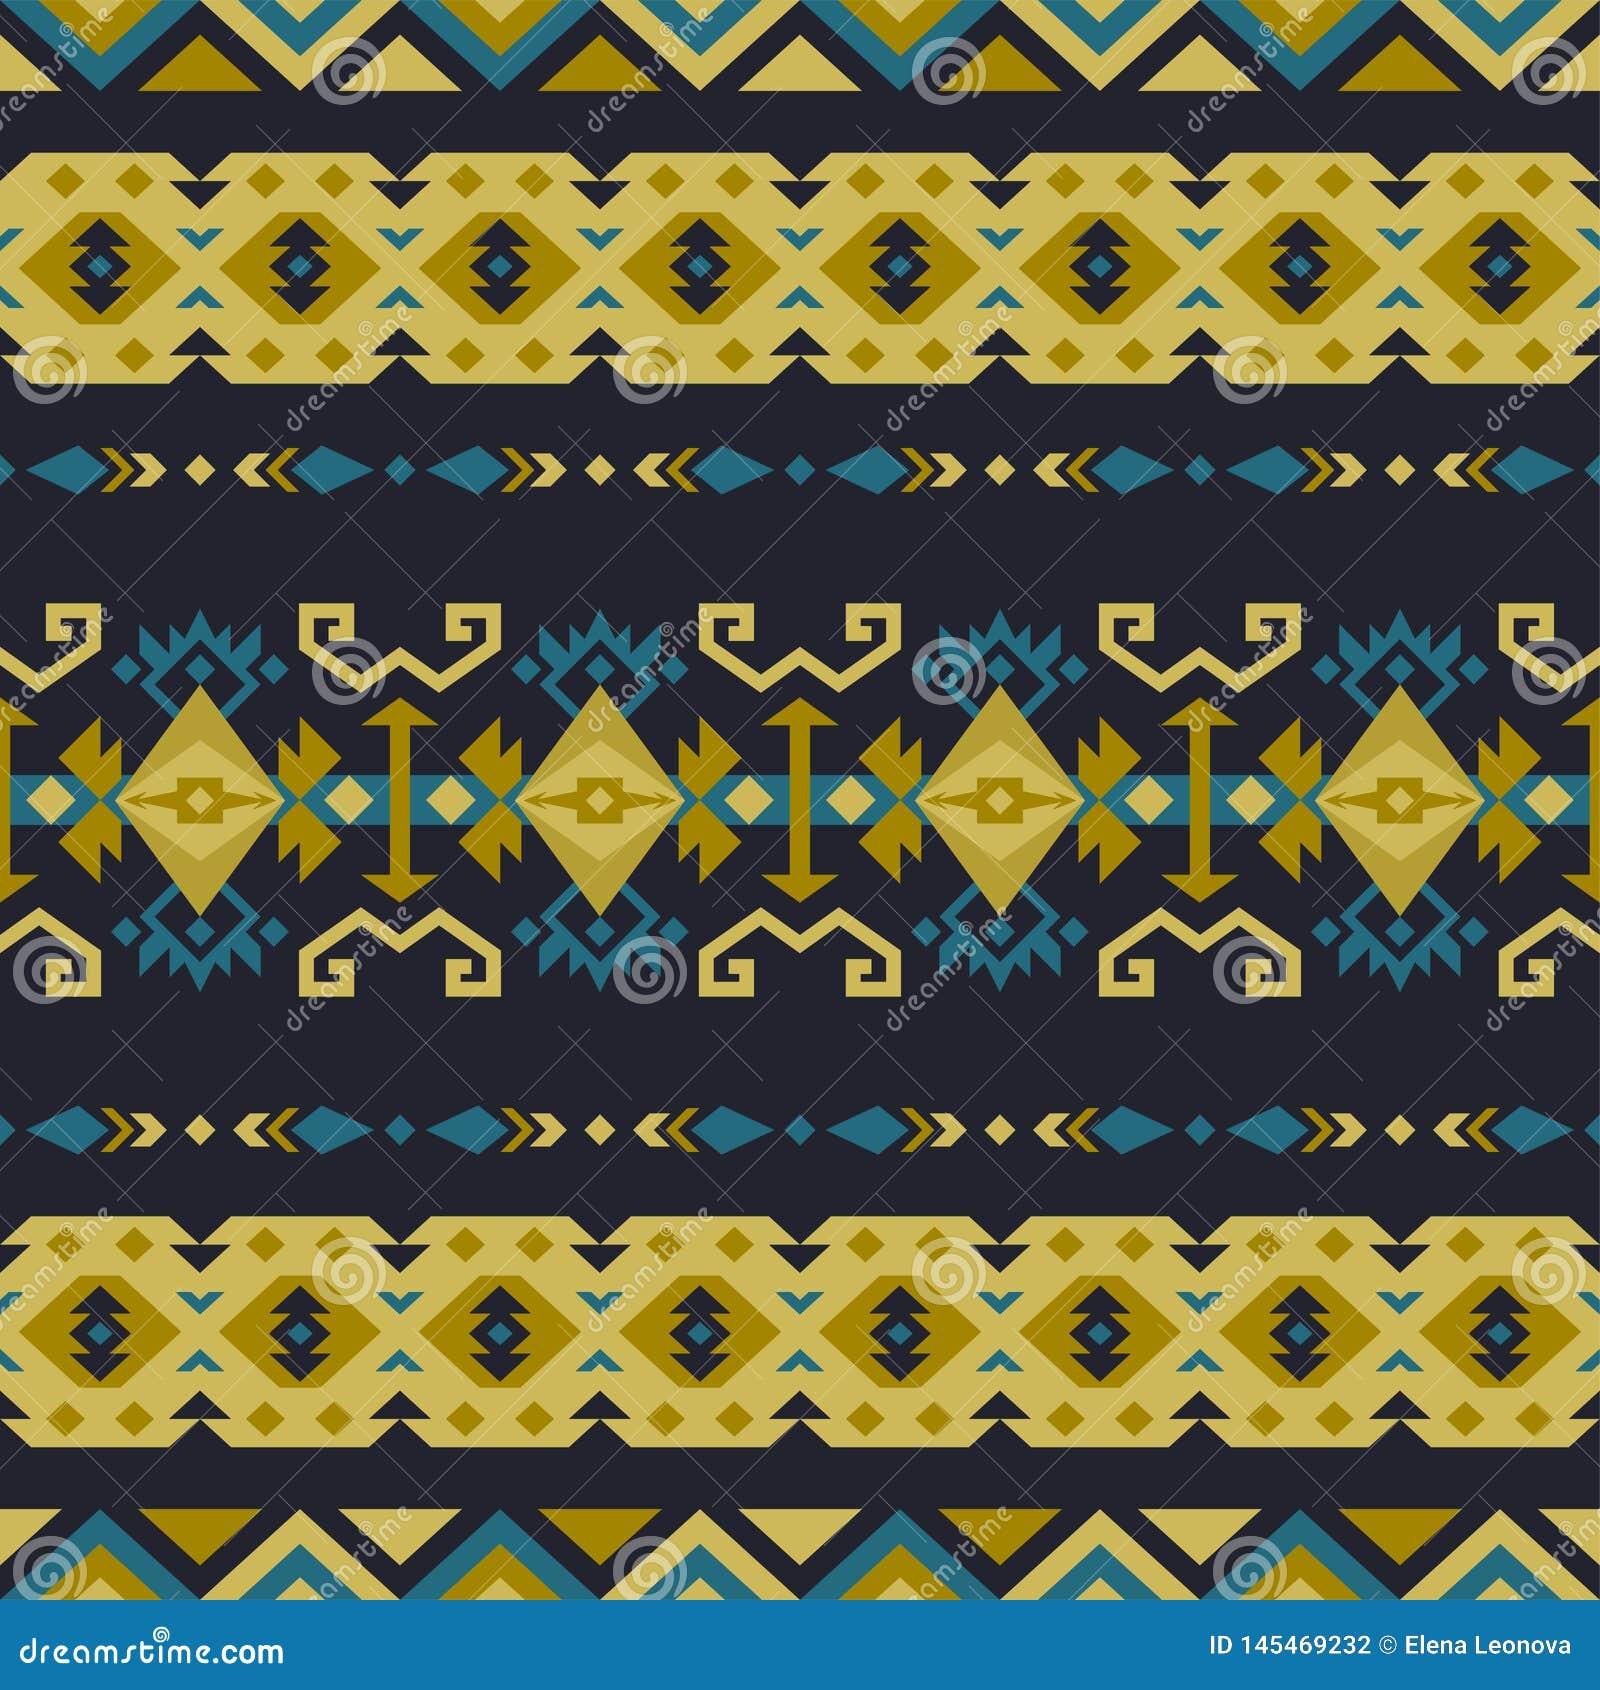 Native Southwest American, Indian, Aztec, Navajo seamless pattern. Geometric design